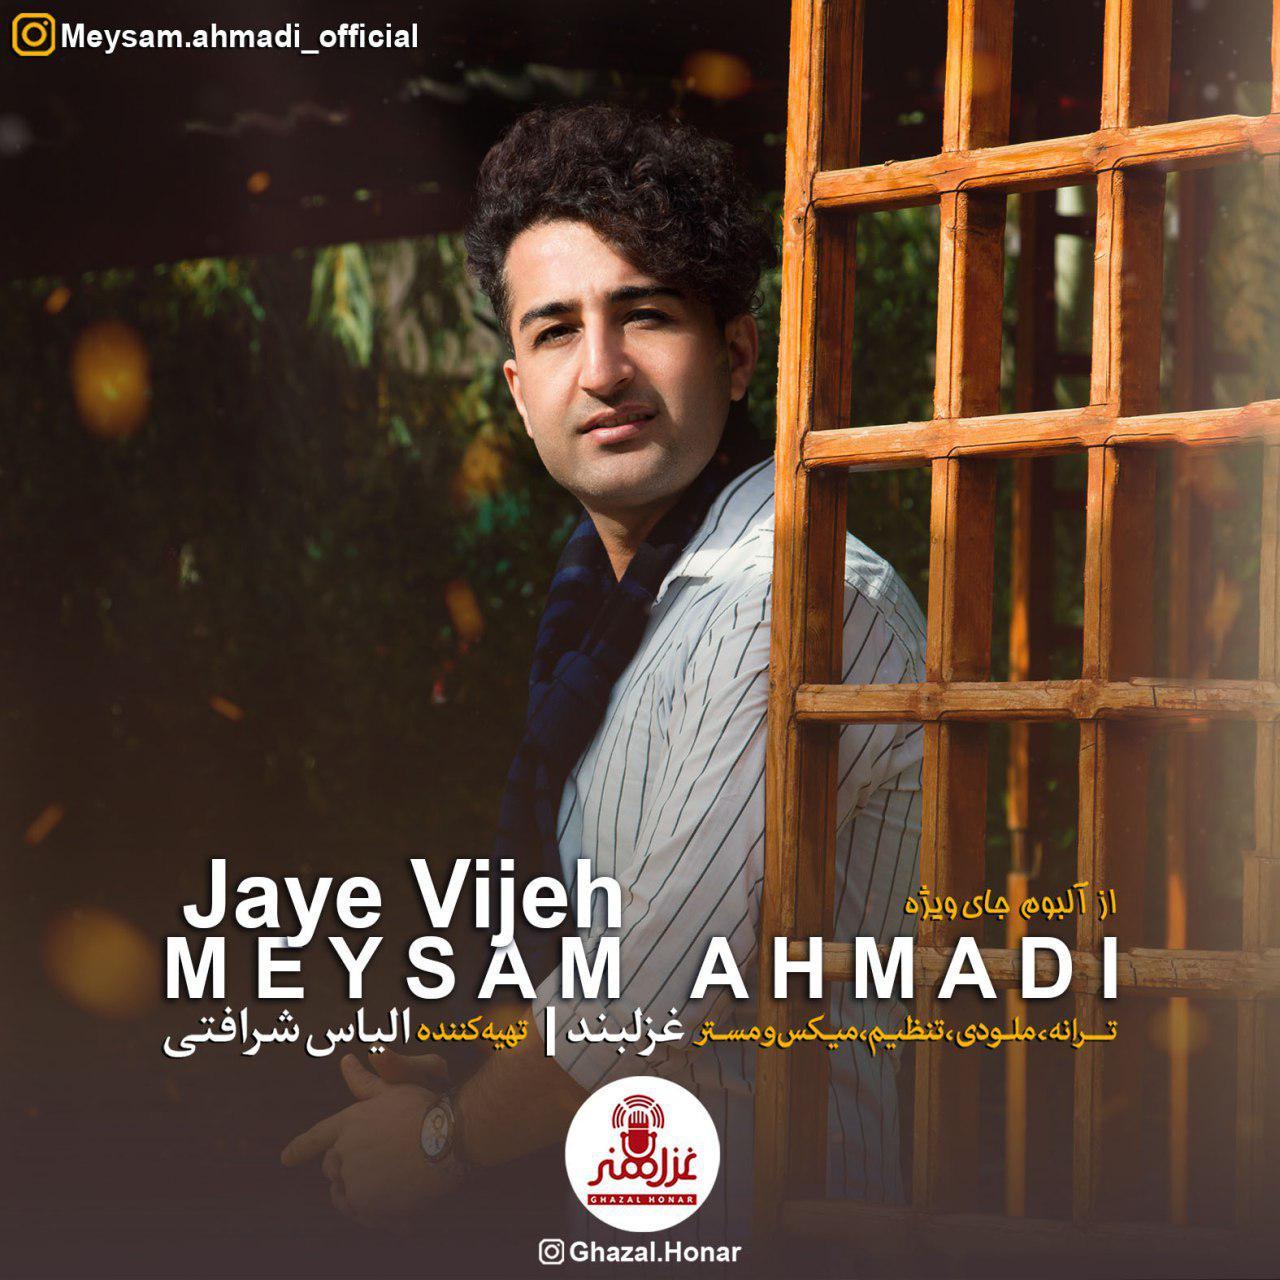 Meysam Ahmadi – Jaye Vijeh